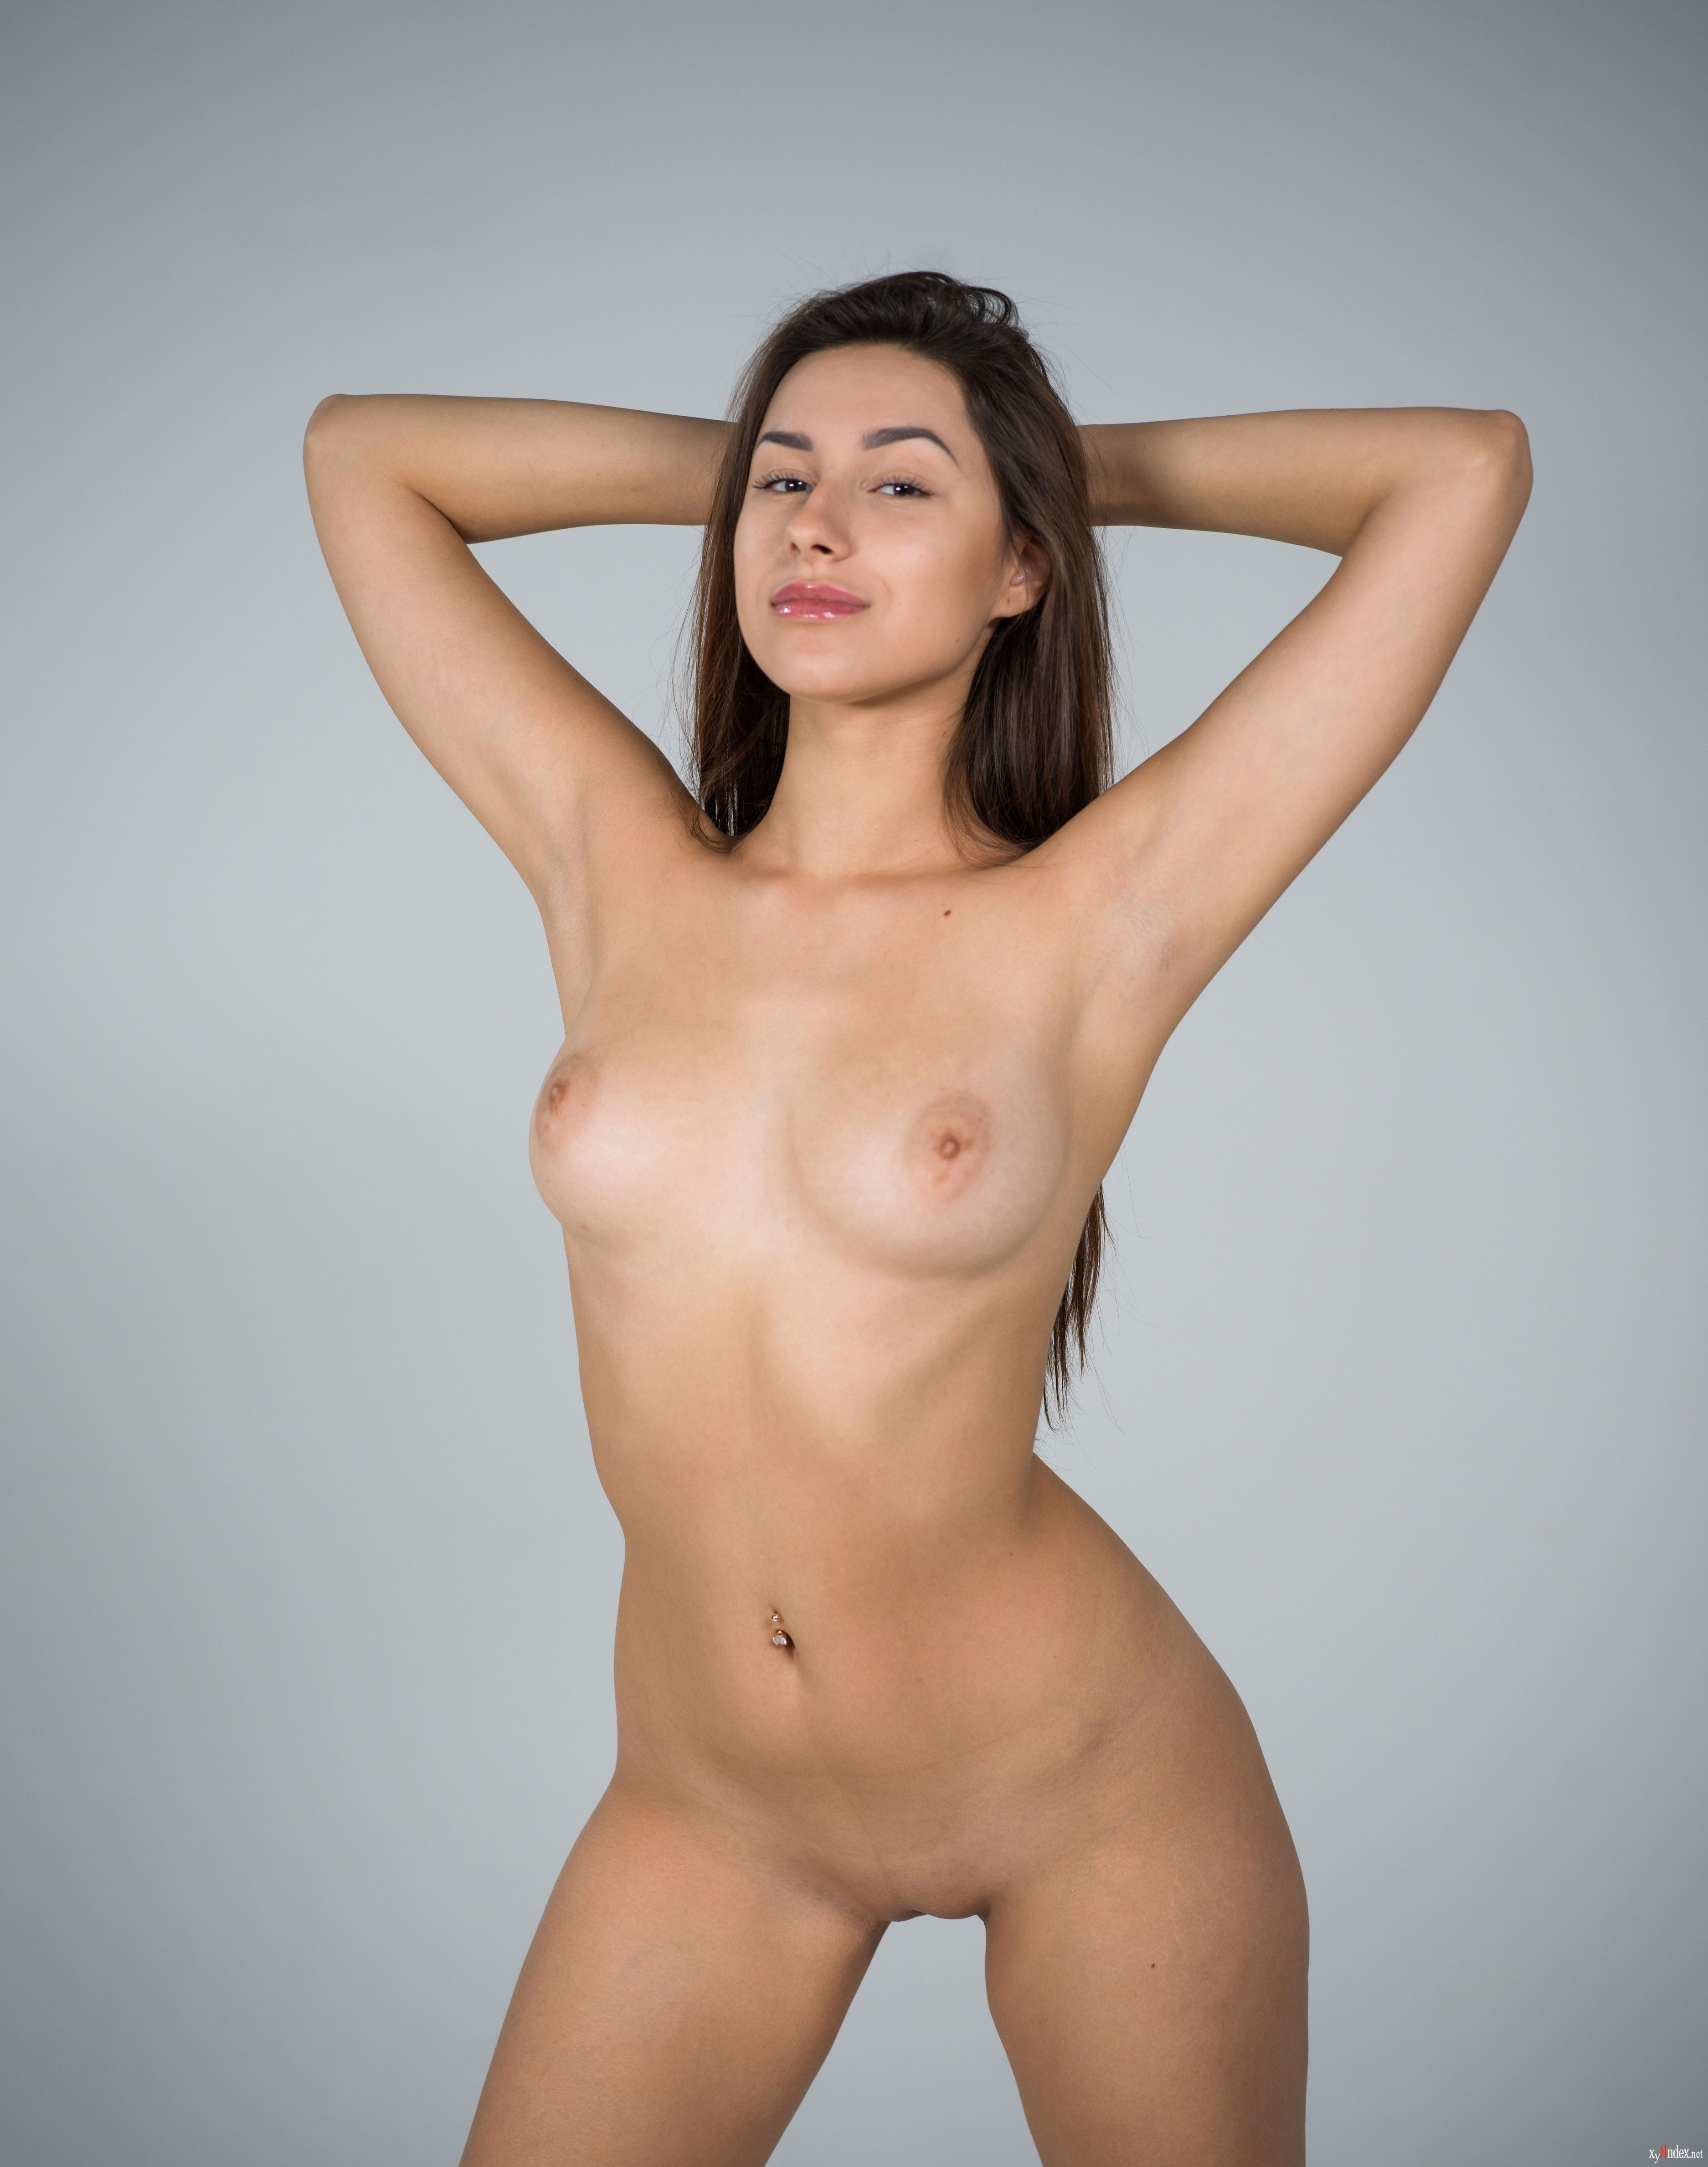 Angelina jolie nude pictures hottest sex scenes